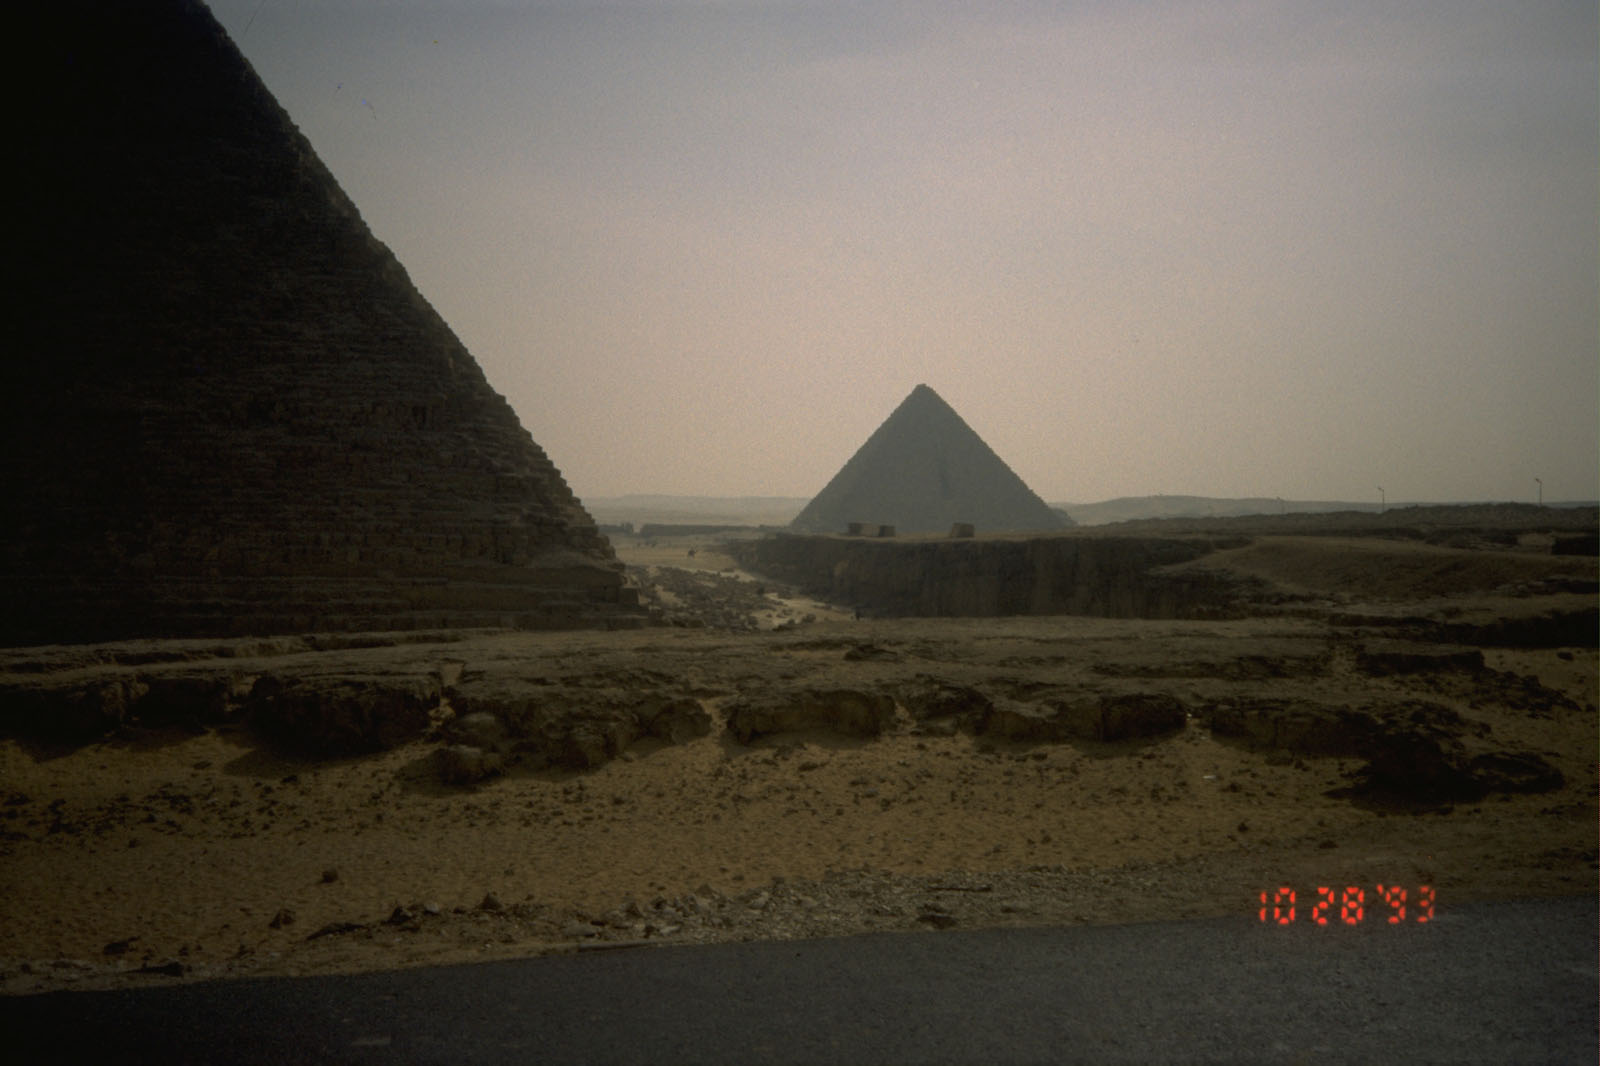 Khafre Pyramid Complex: Site: Giza; View: Khafre pyramid, Menkaure pyramid